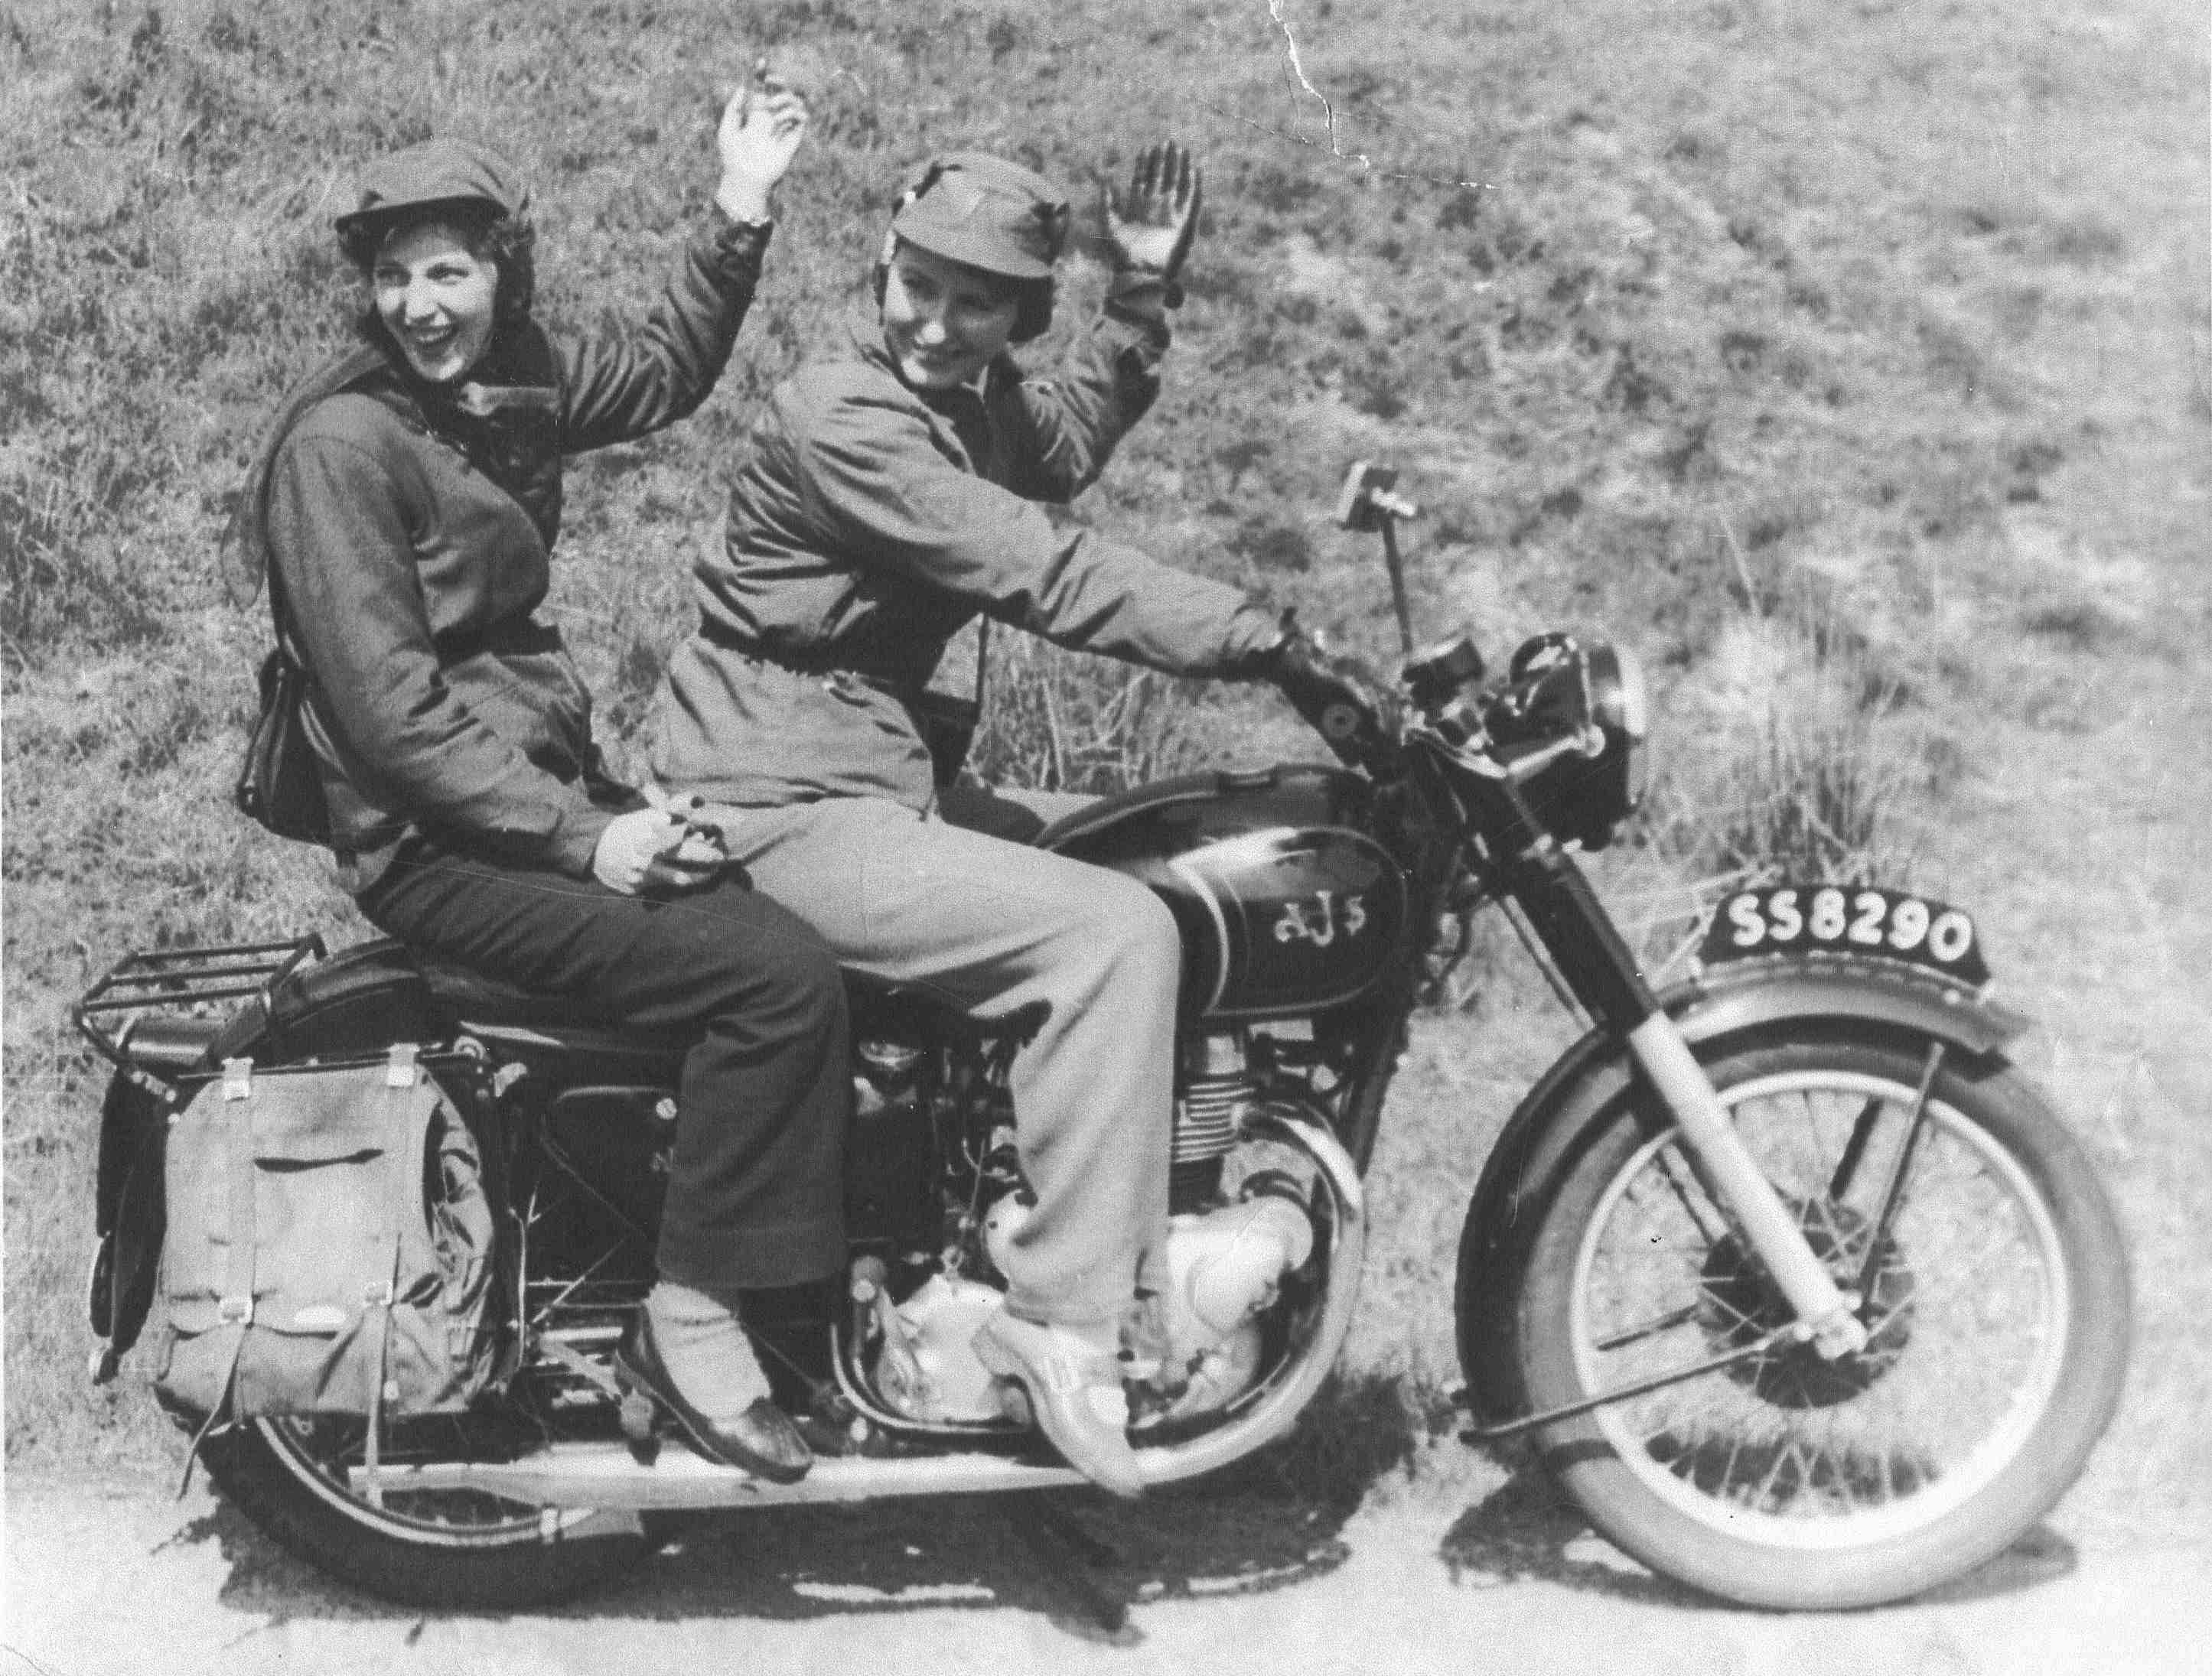 Two Women Riding Motorbike 1960s